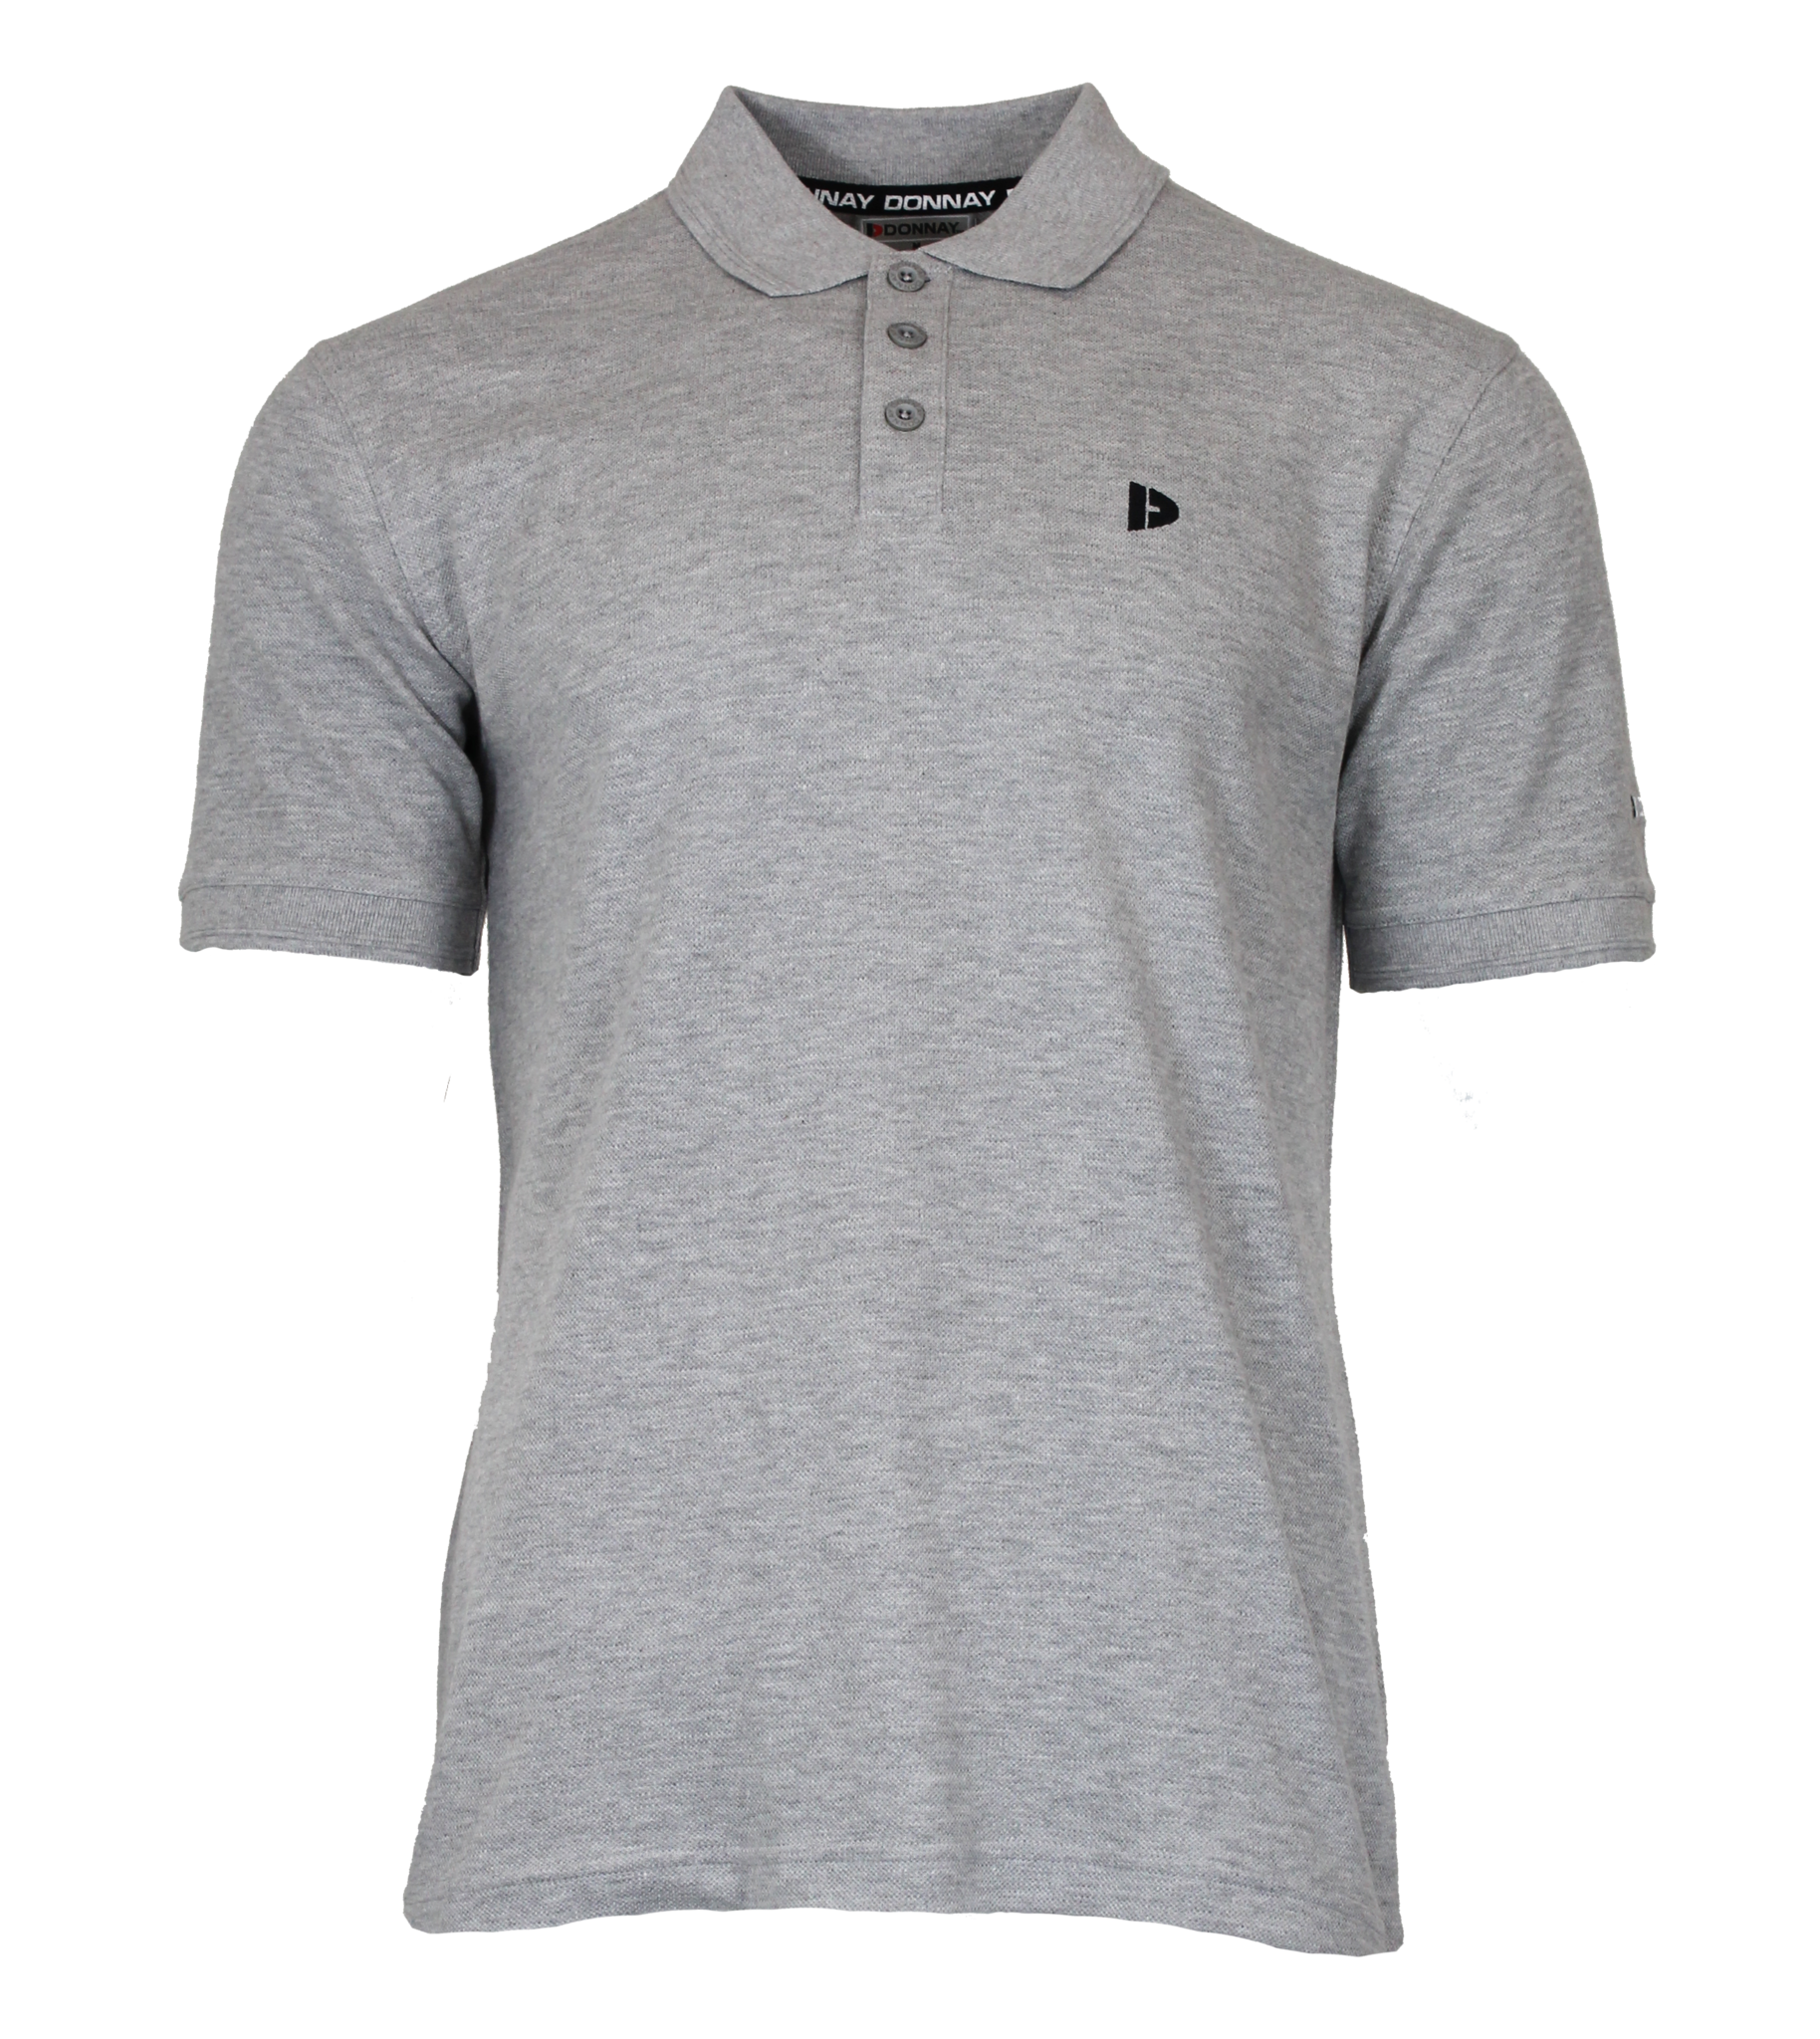 Donnay Donnay Heren - Polo shirt Noah - Lichtgrijs gemêleerd